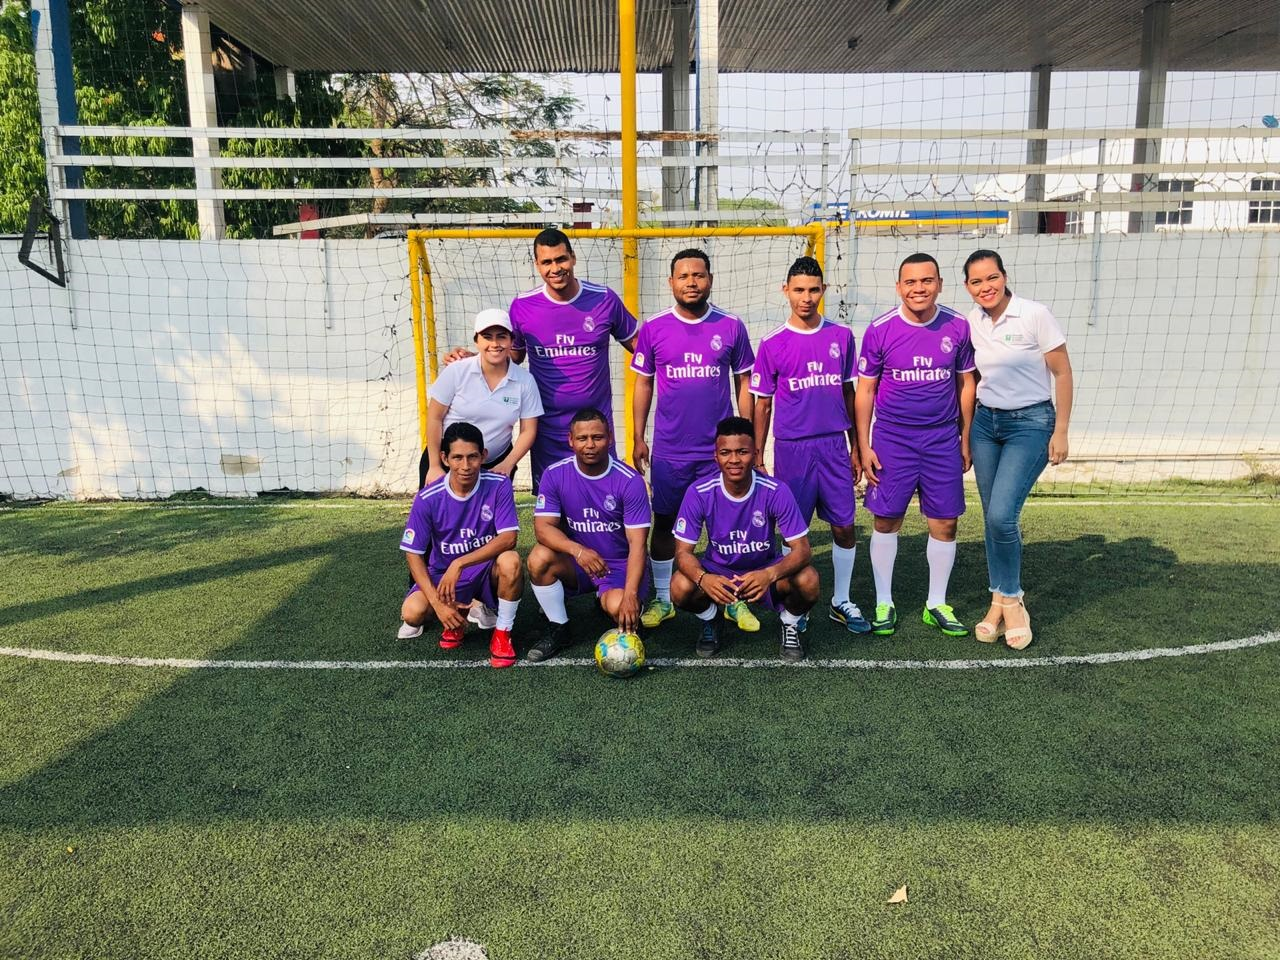 Torneo de futbol en la UTB